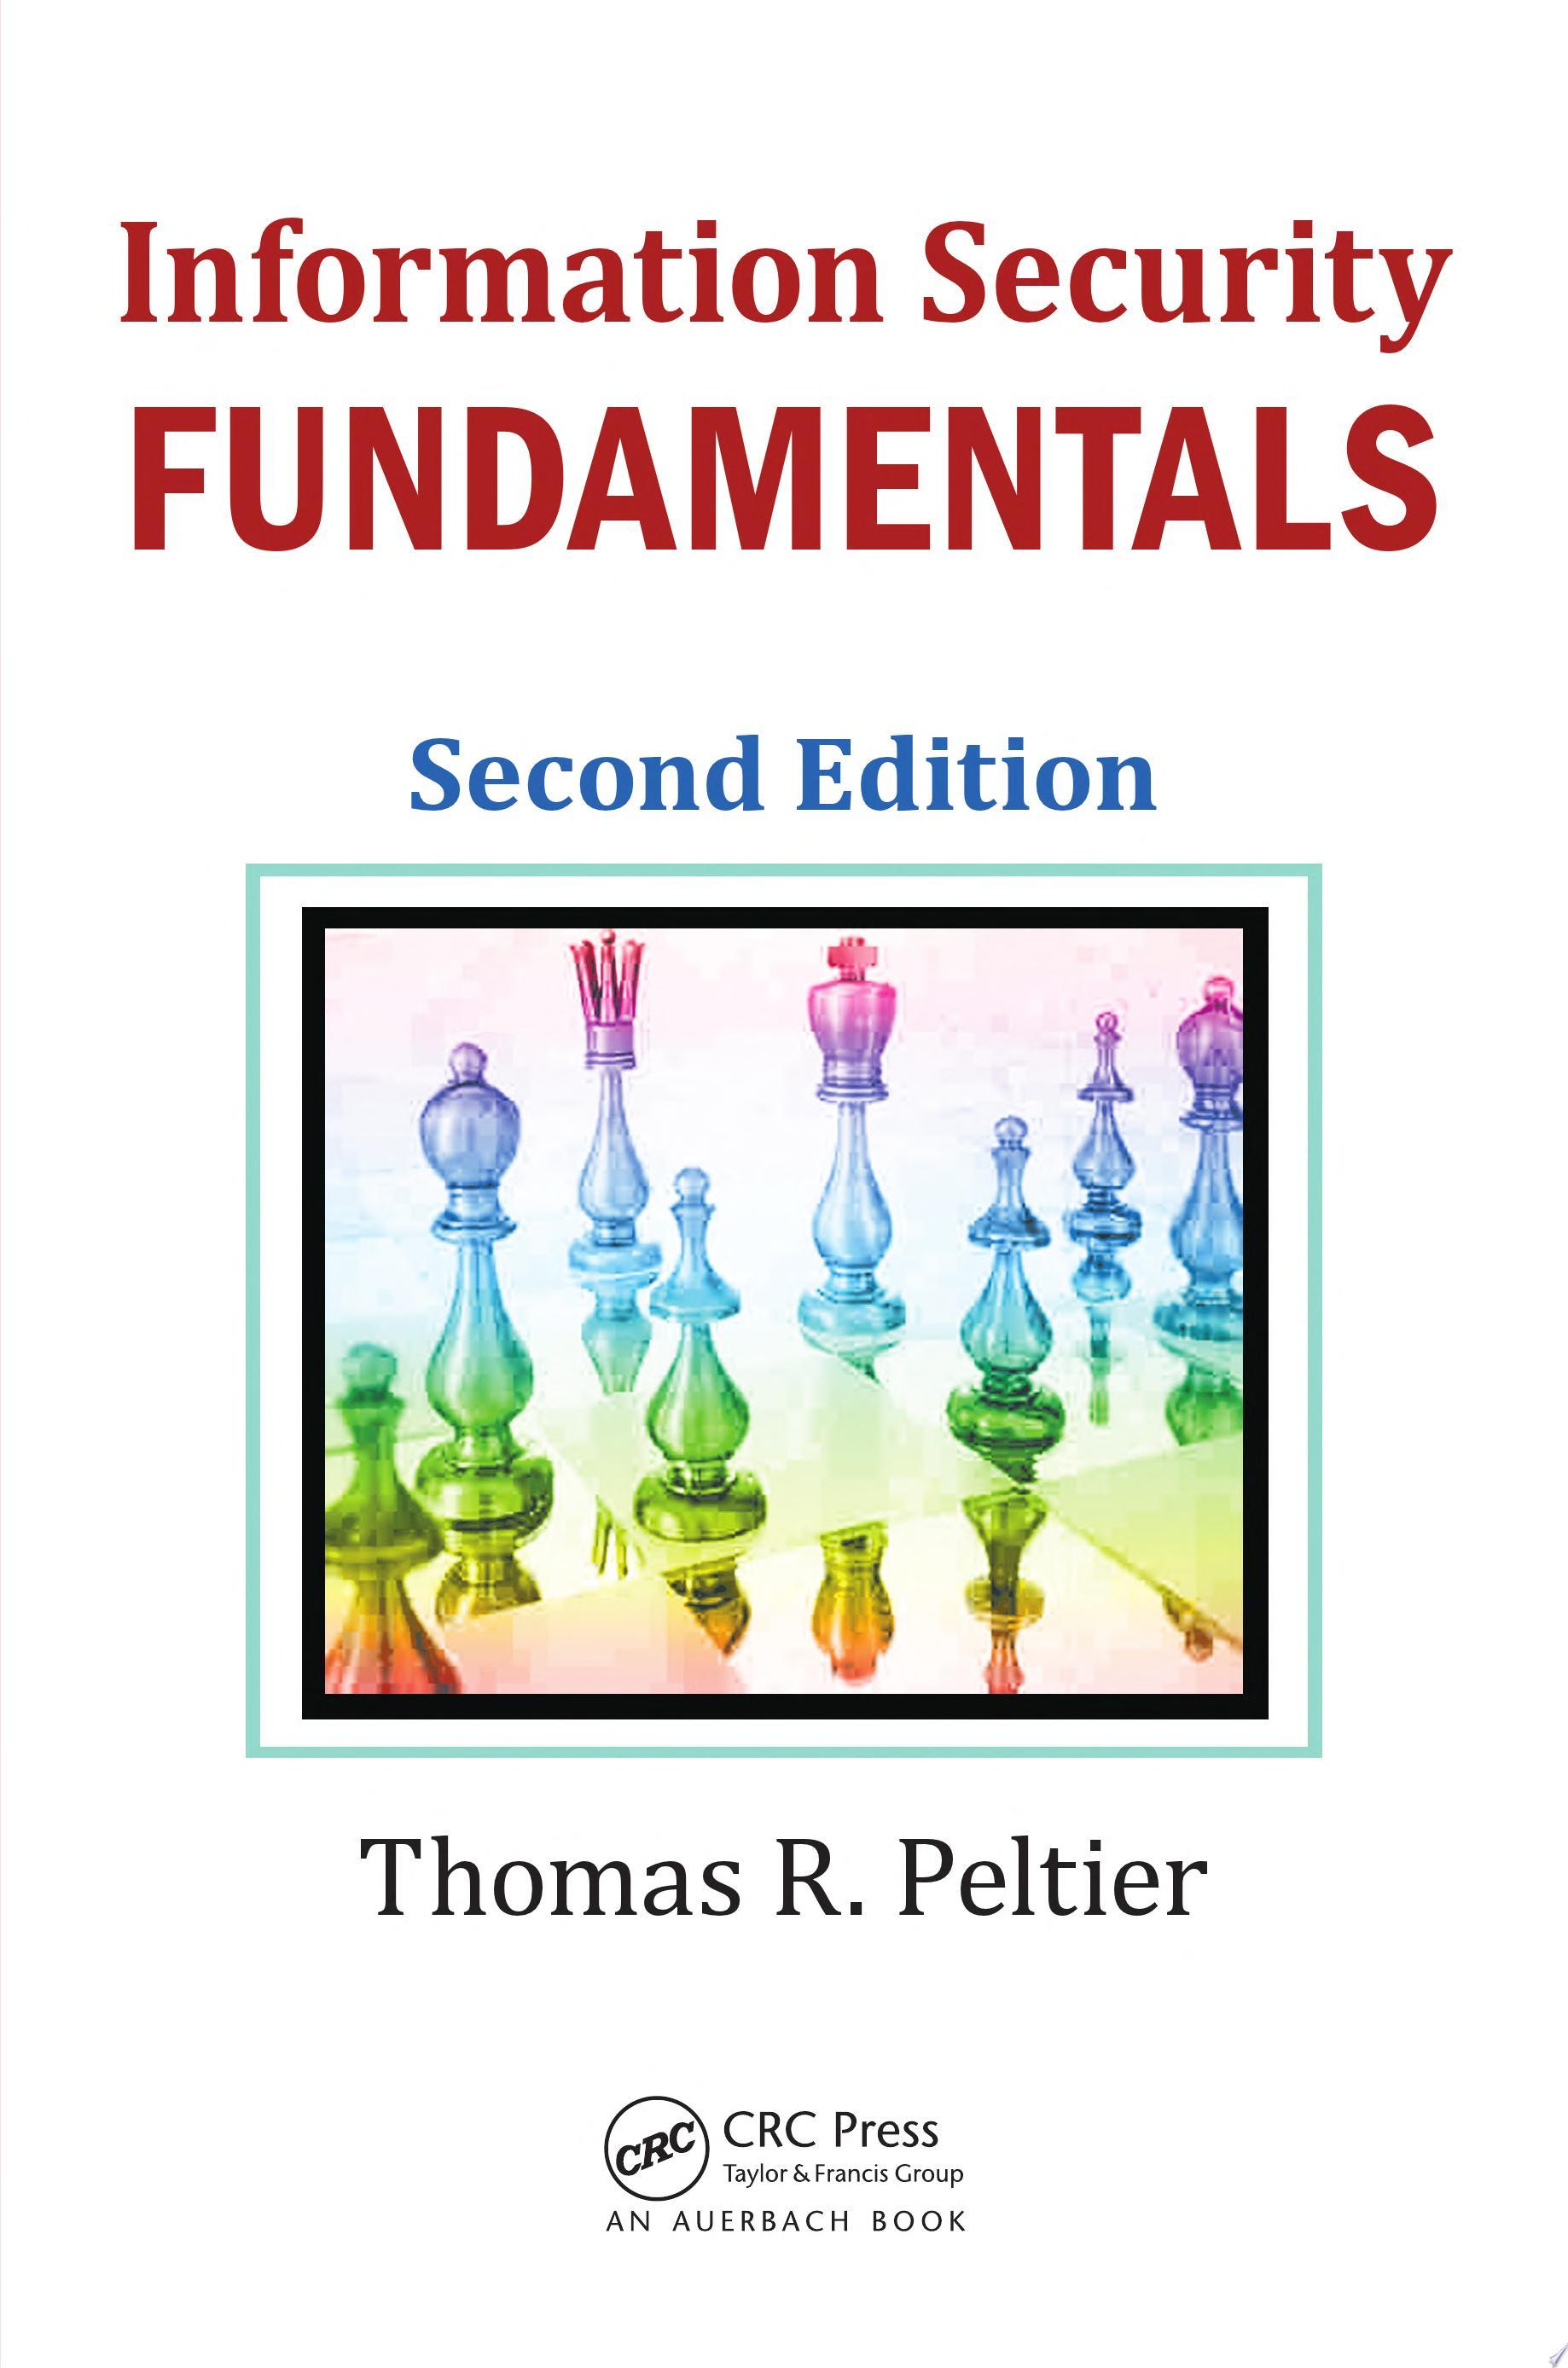 Information Security Fundamentals  Second Edition